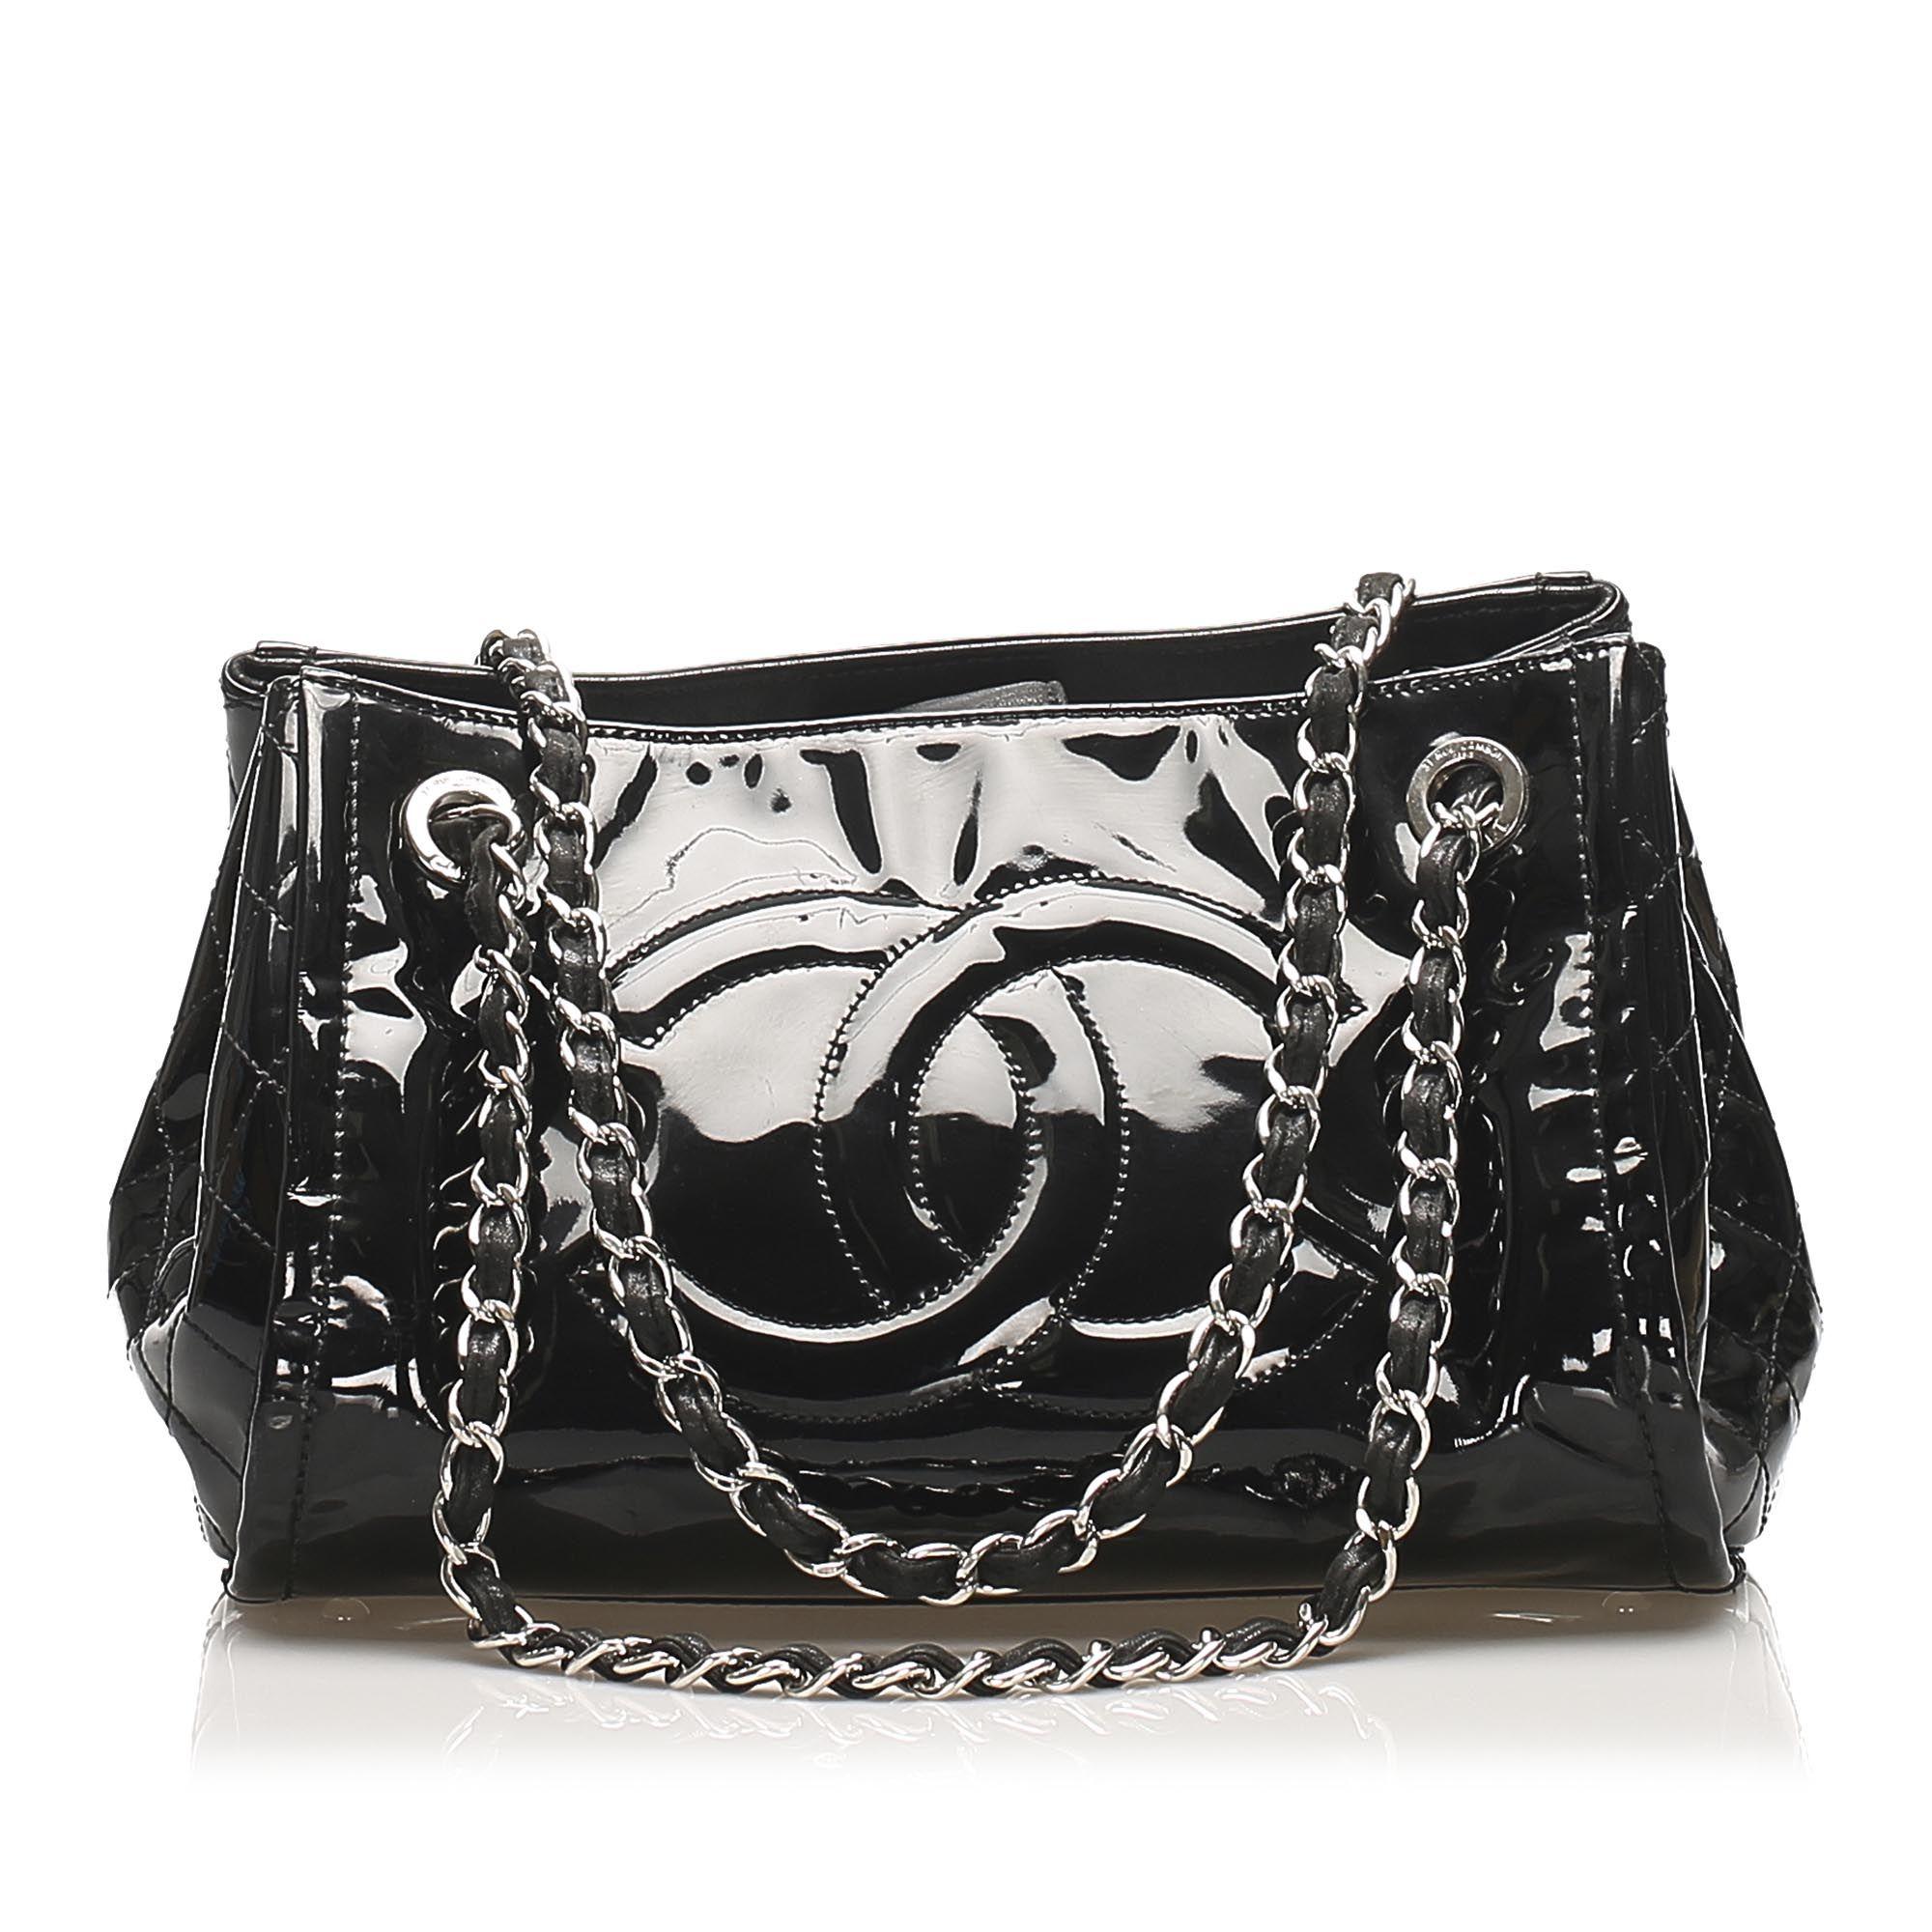 Vintage Chanel CC Patent Leather Tote Bag Black